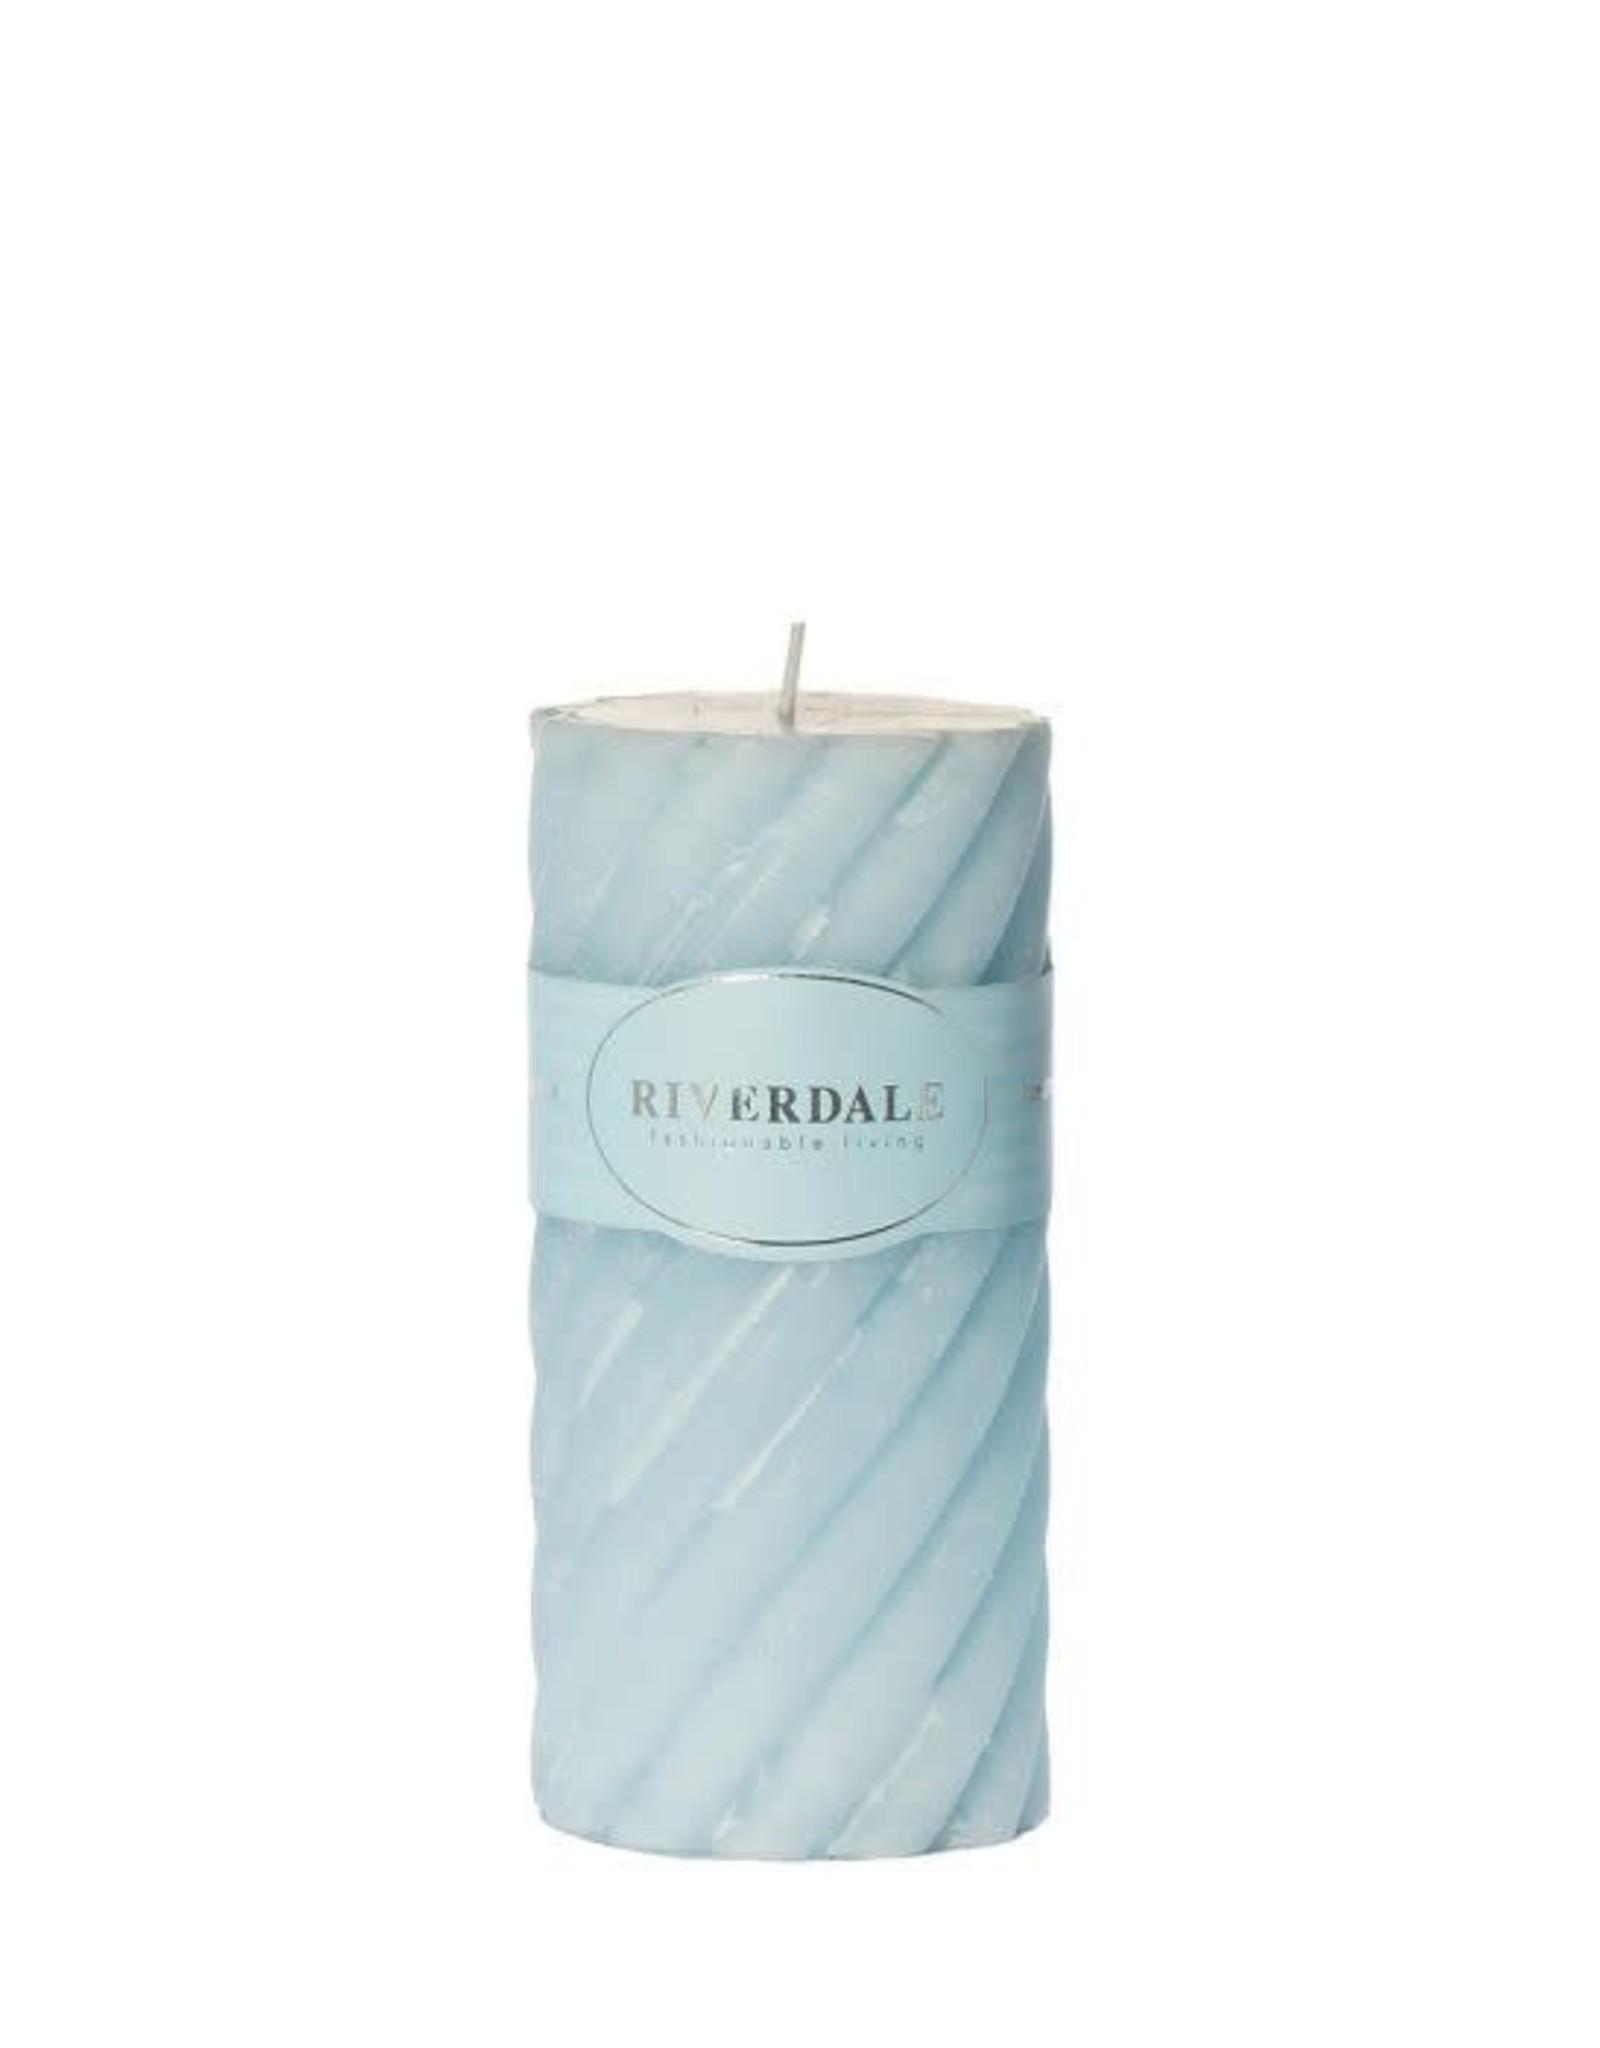 Riverdale Candle Swirl light blue 7.5x15cm